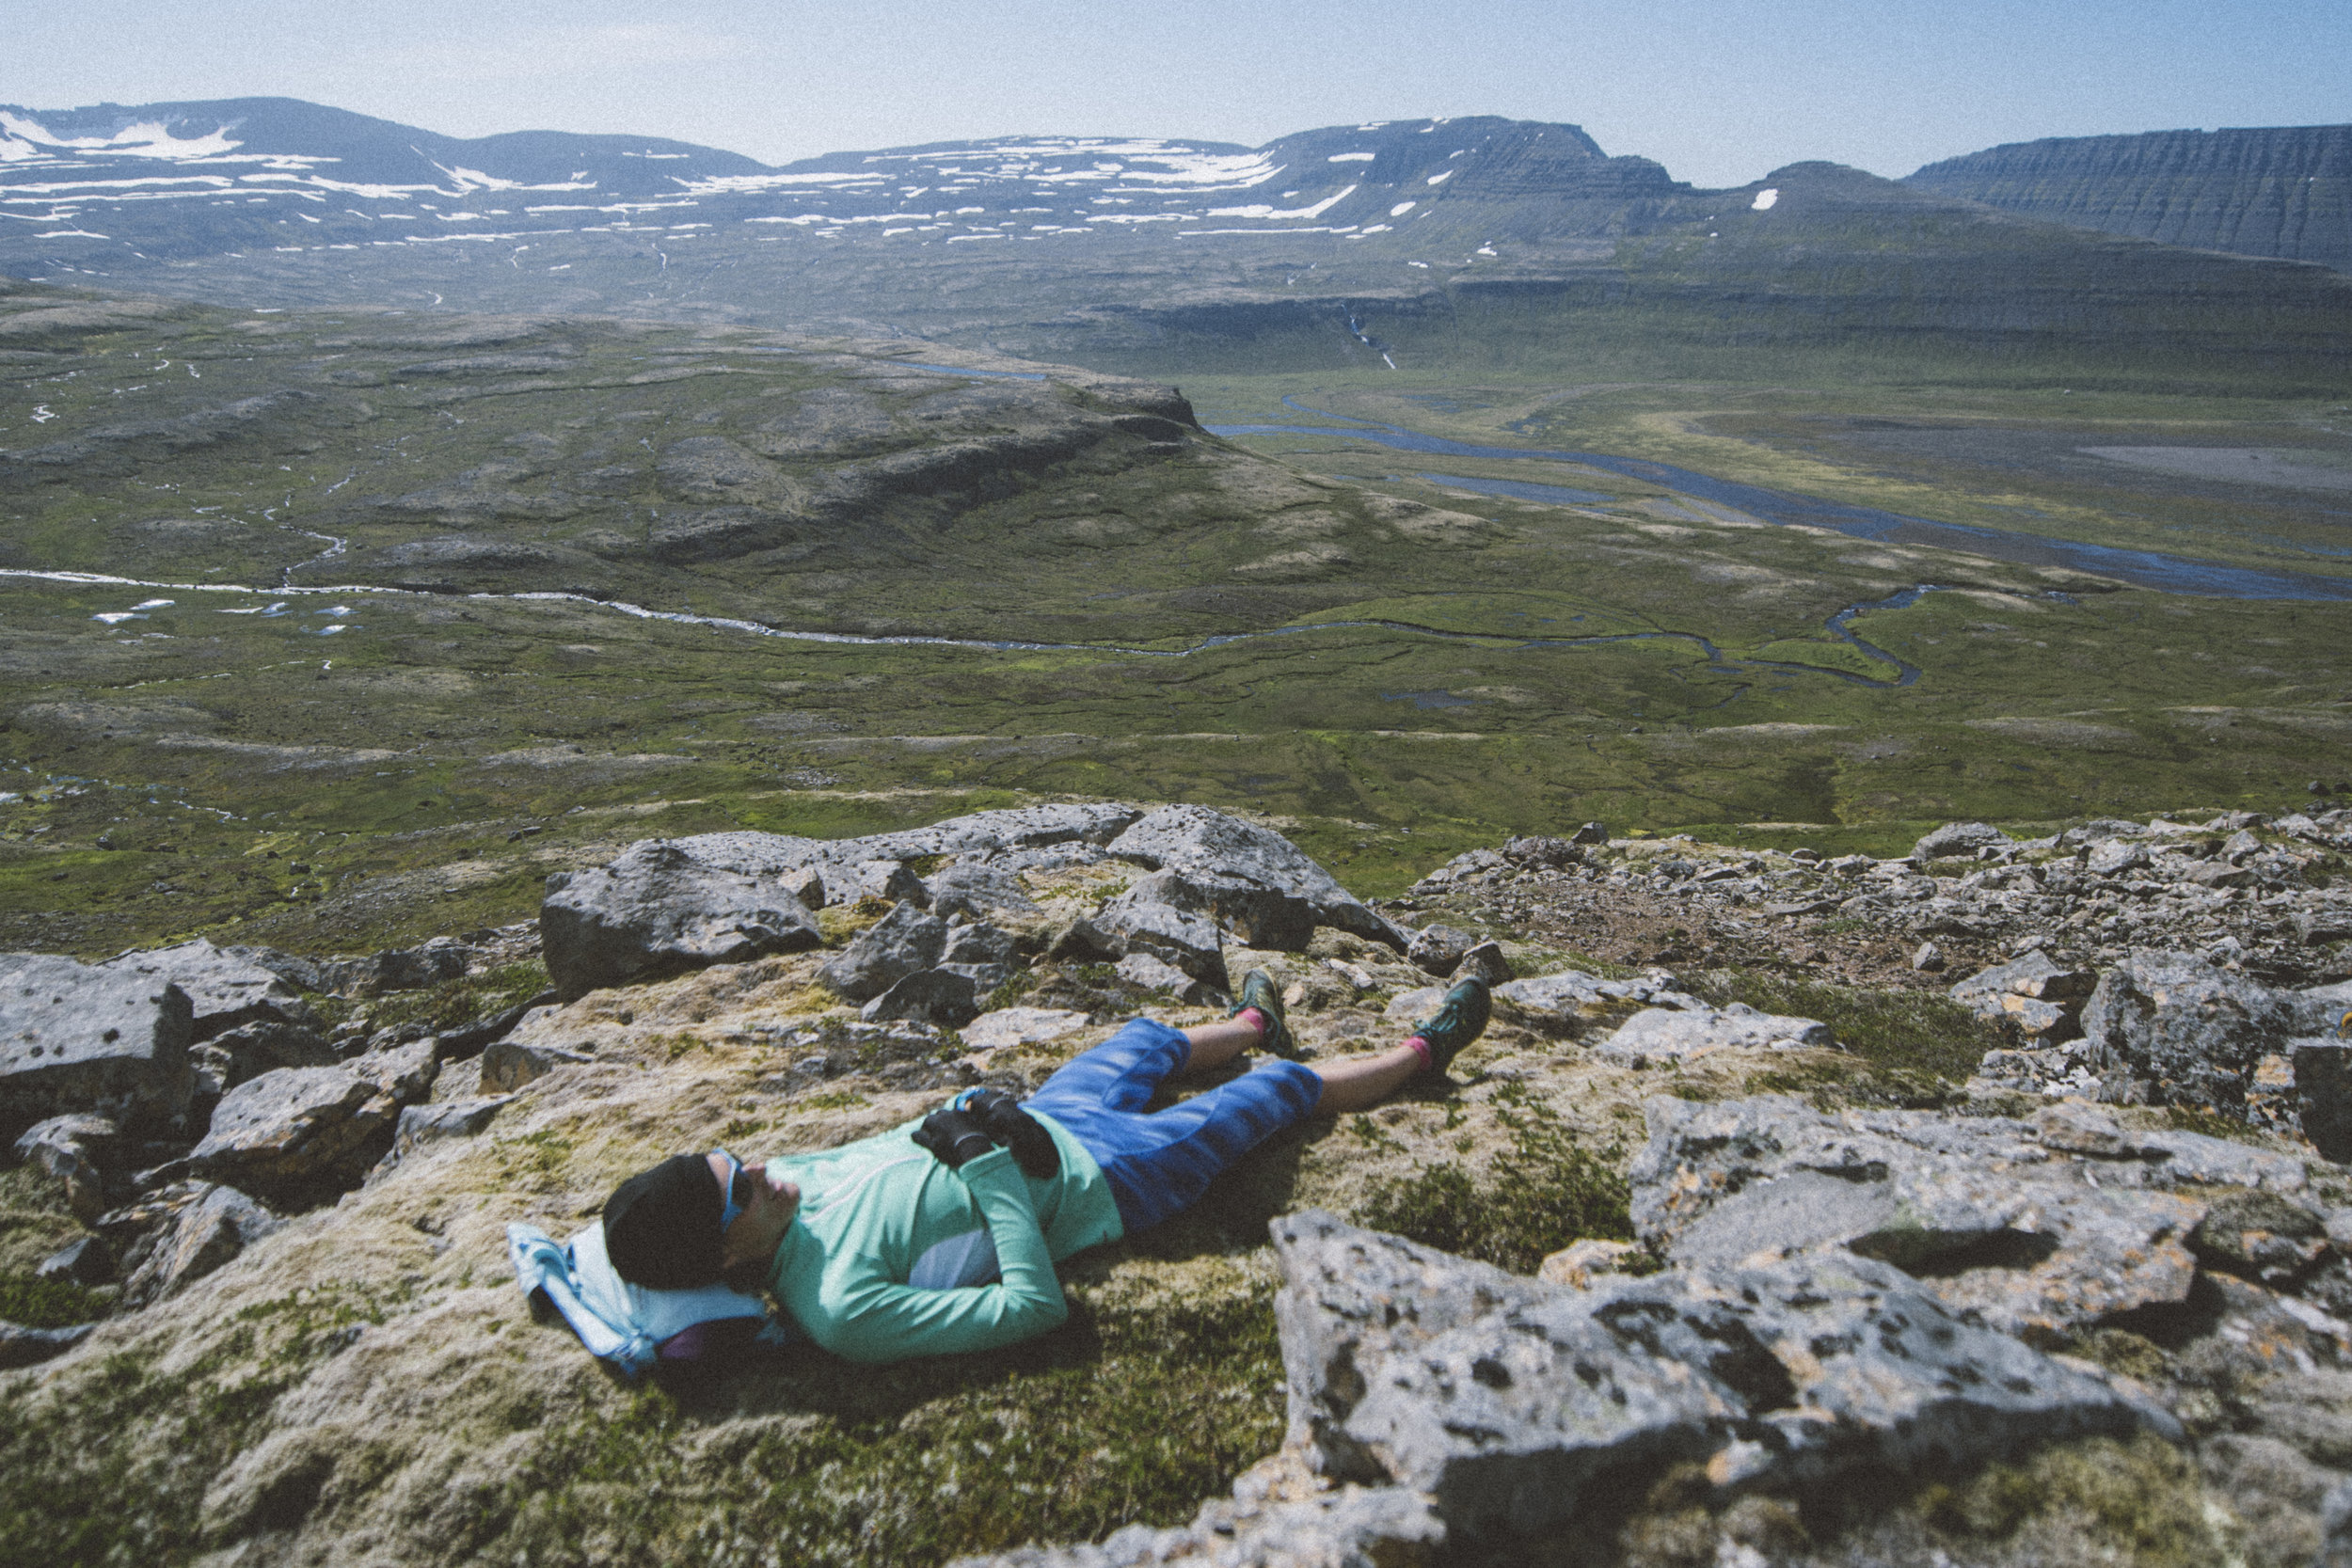 KT_160713_ThuleTrails_Iceland_0720.jpg